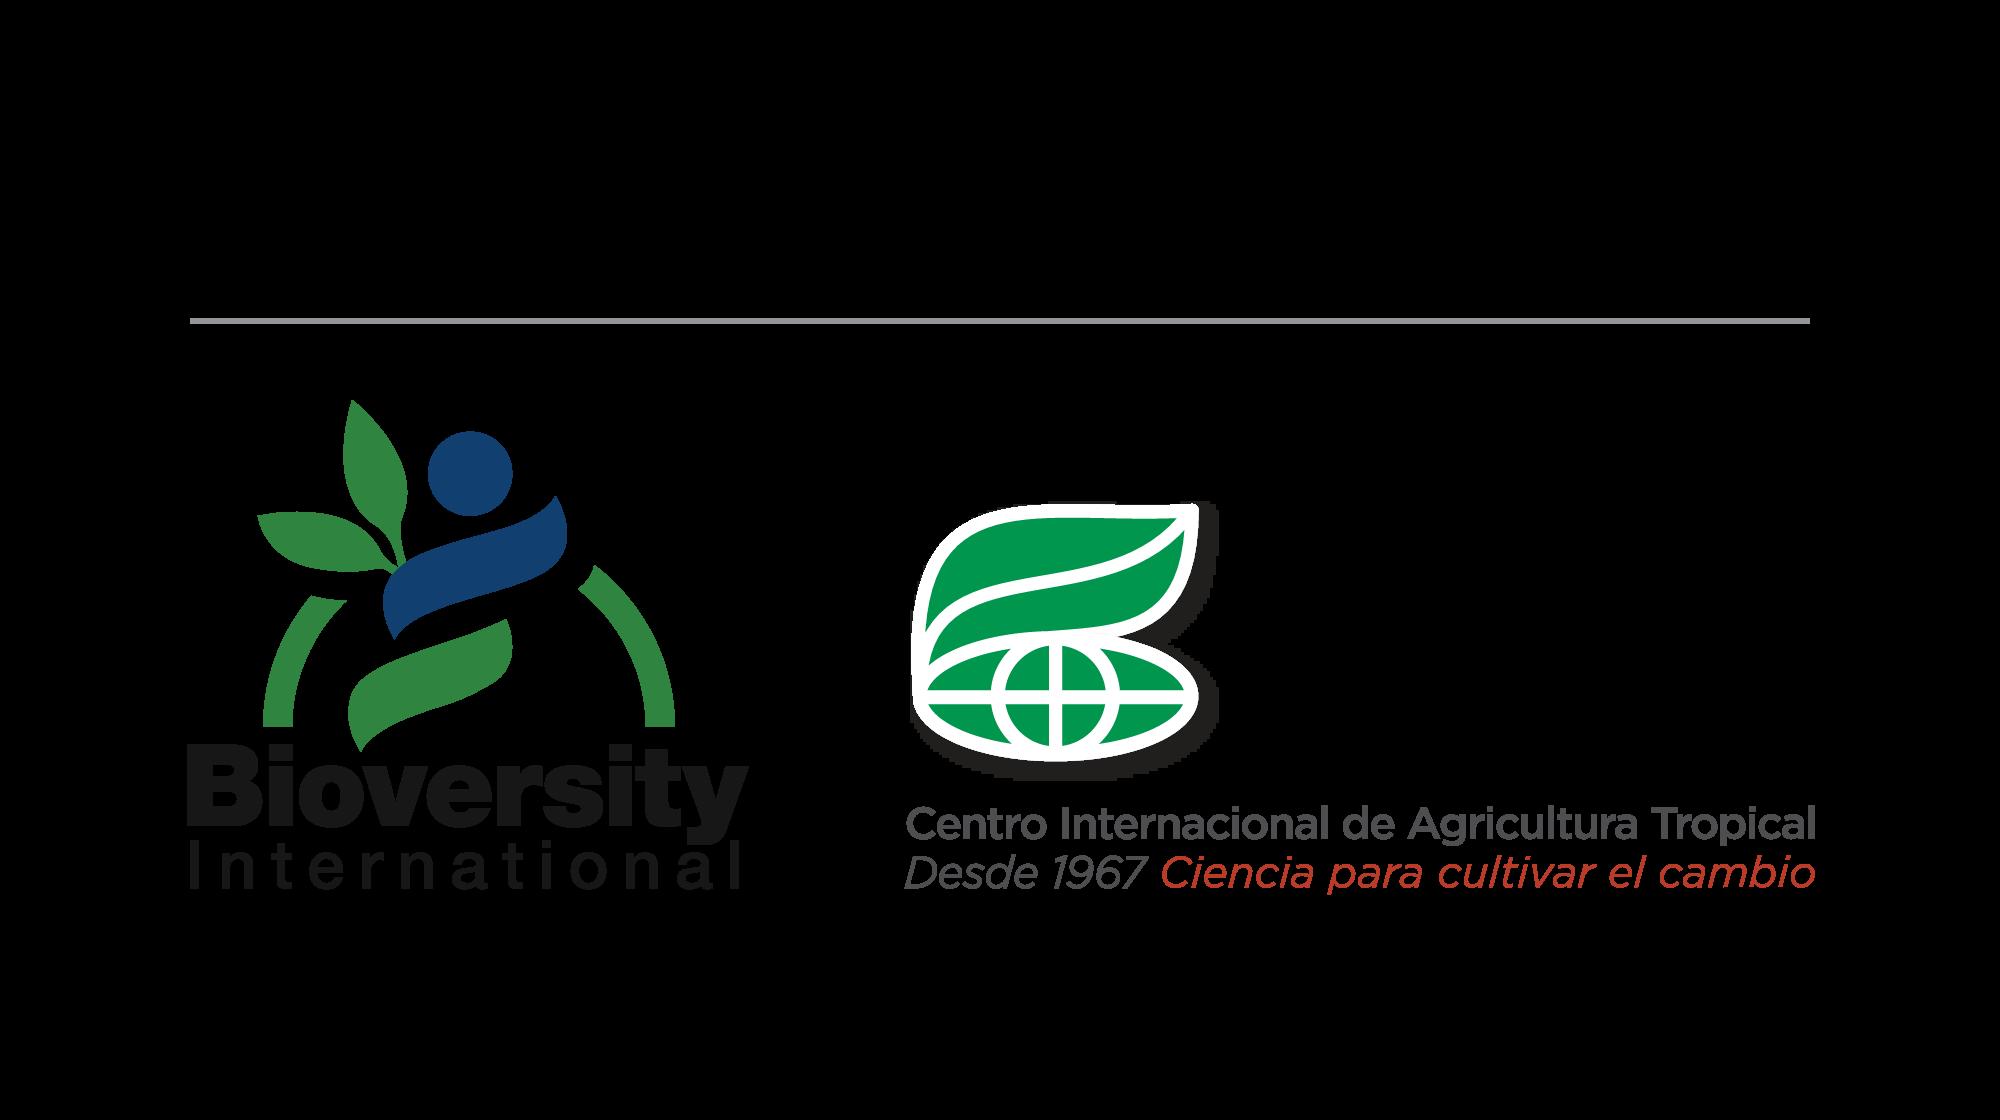 Alianza Internacional Bioversity - CIAT (Alianza Internacional Bioversity - CIAT) - Colombia